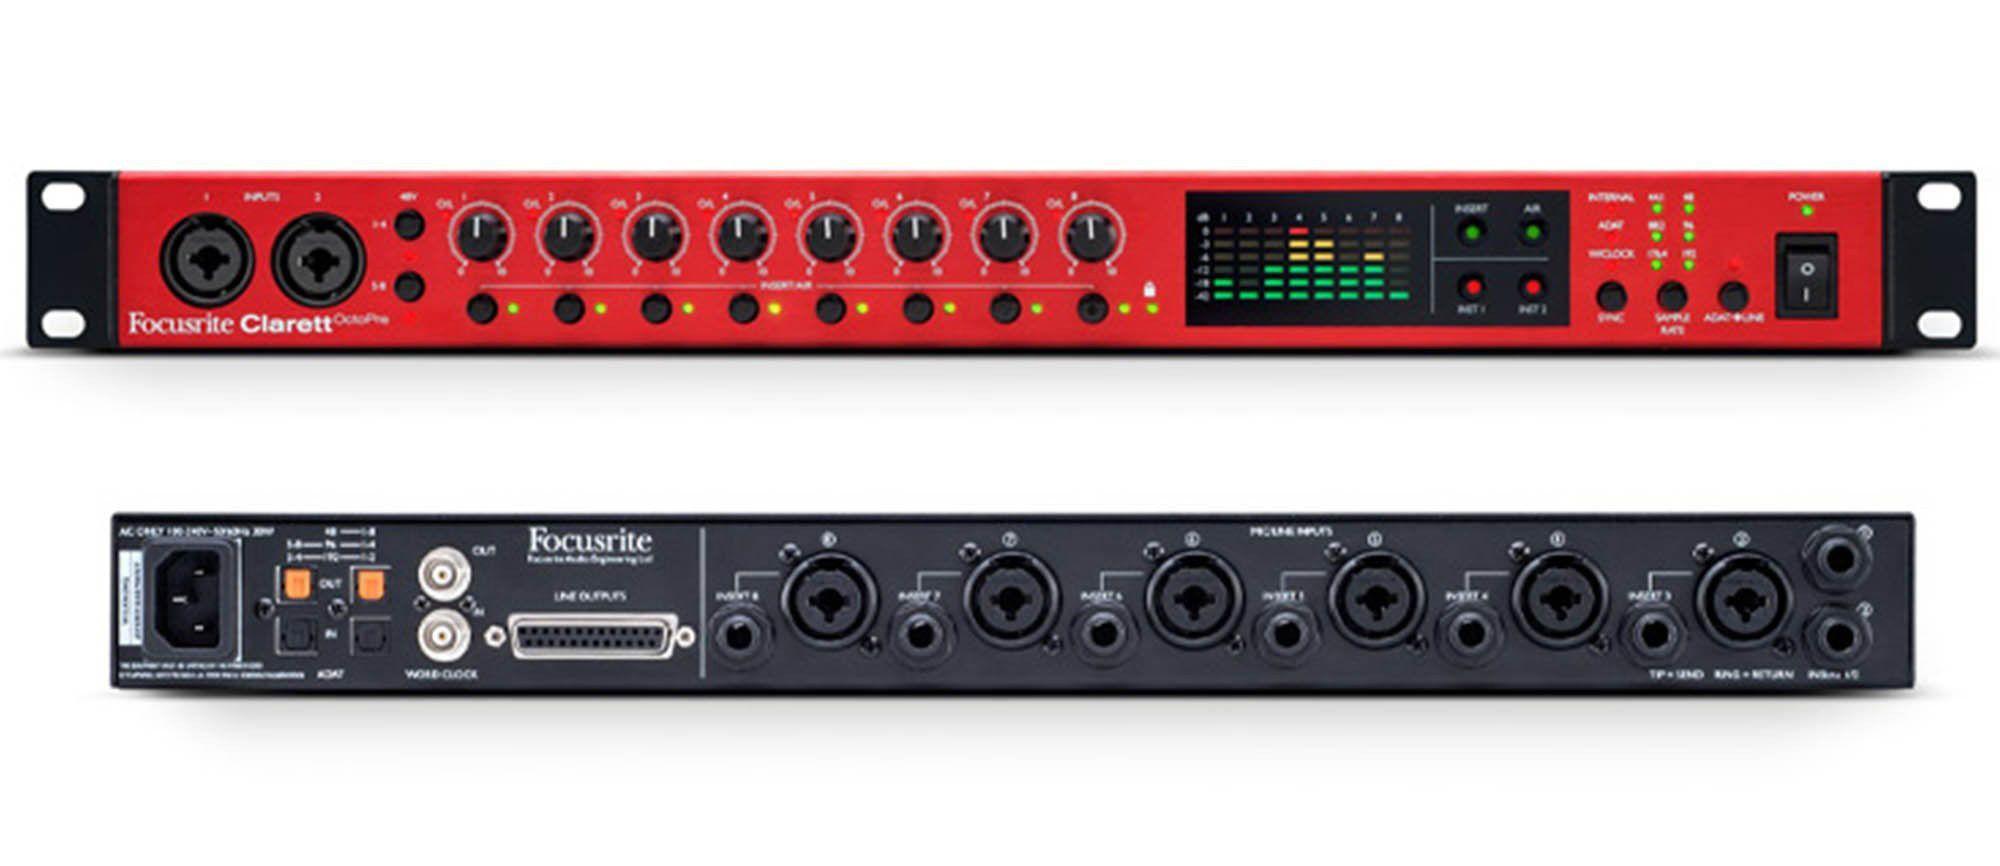 Focusrite Clarett OctoPre Interface de Áudio Octo-Pre 8x8 ADAT Thunderbolt 24-Bit